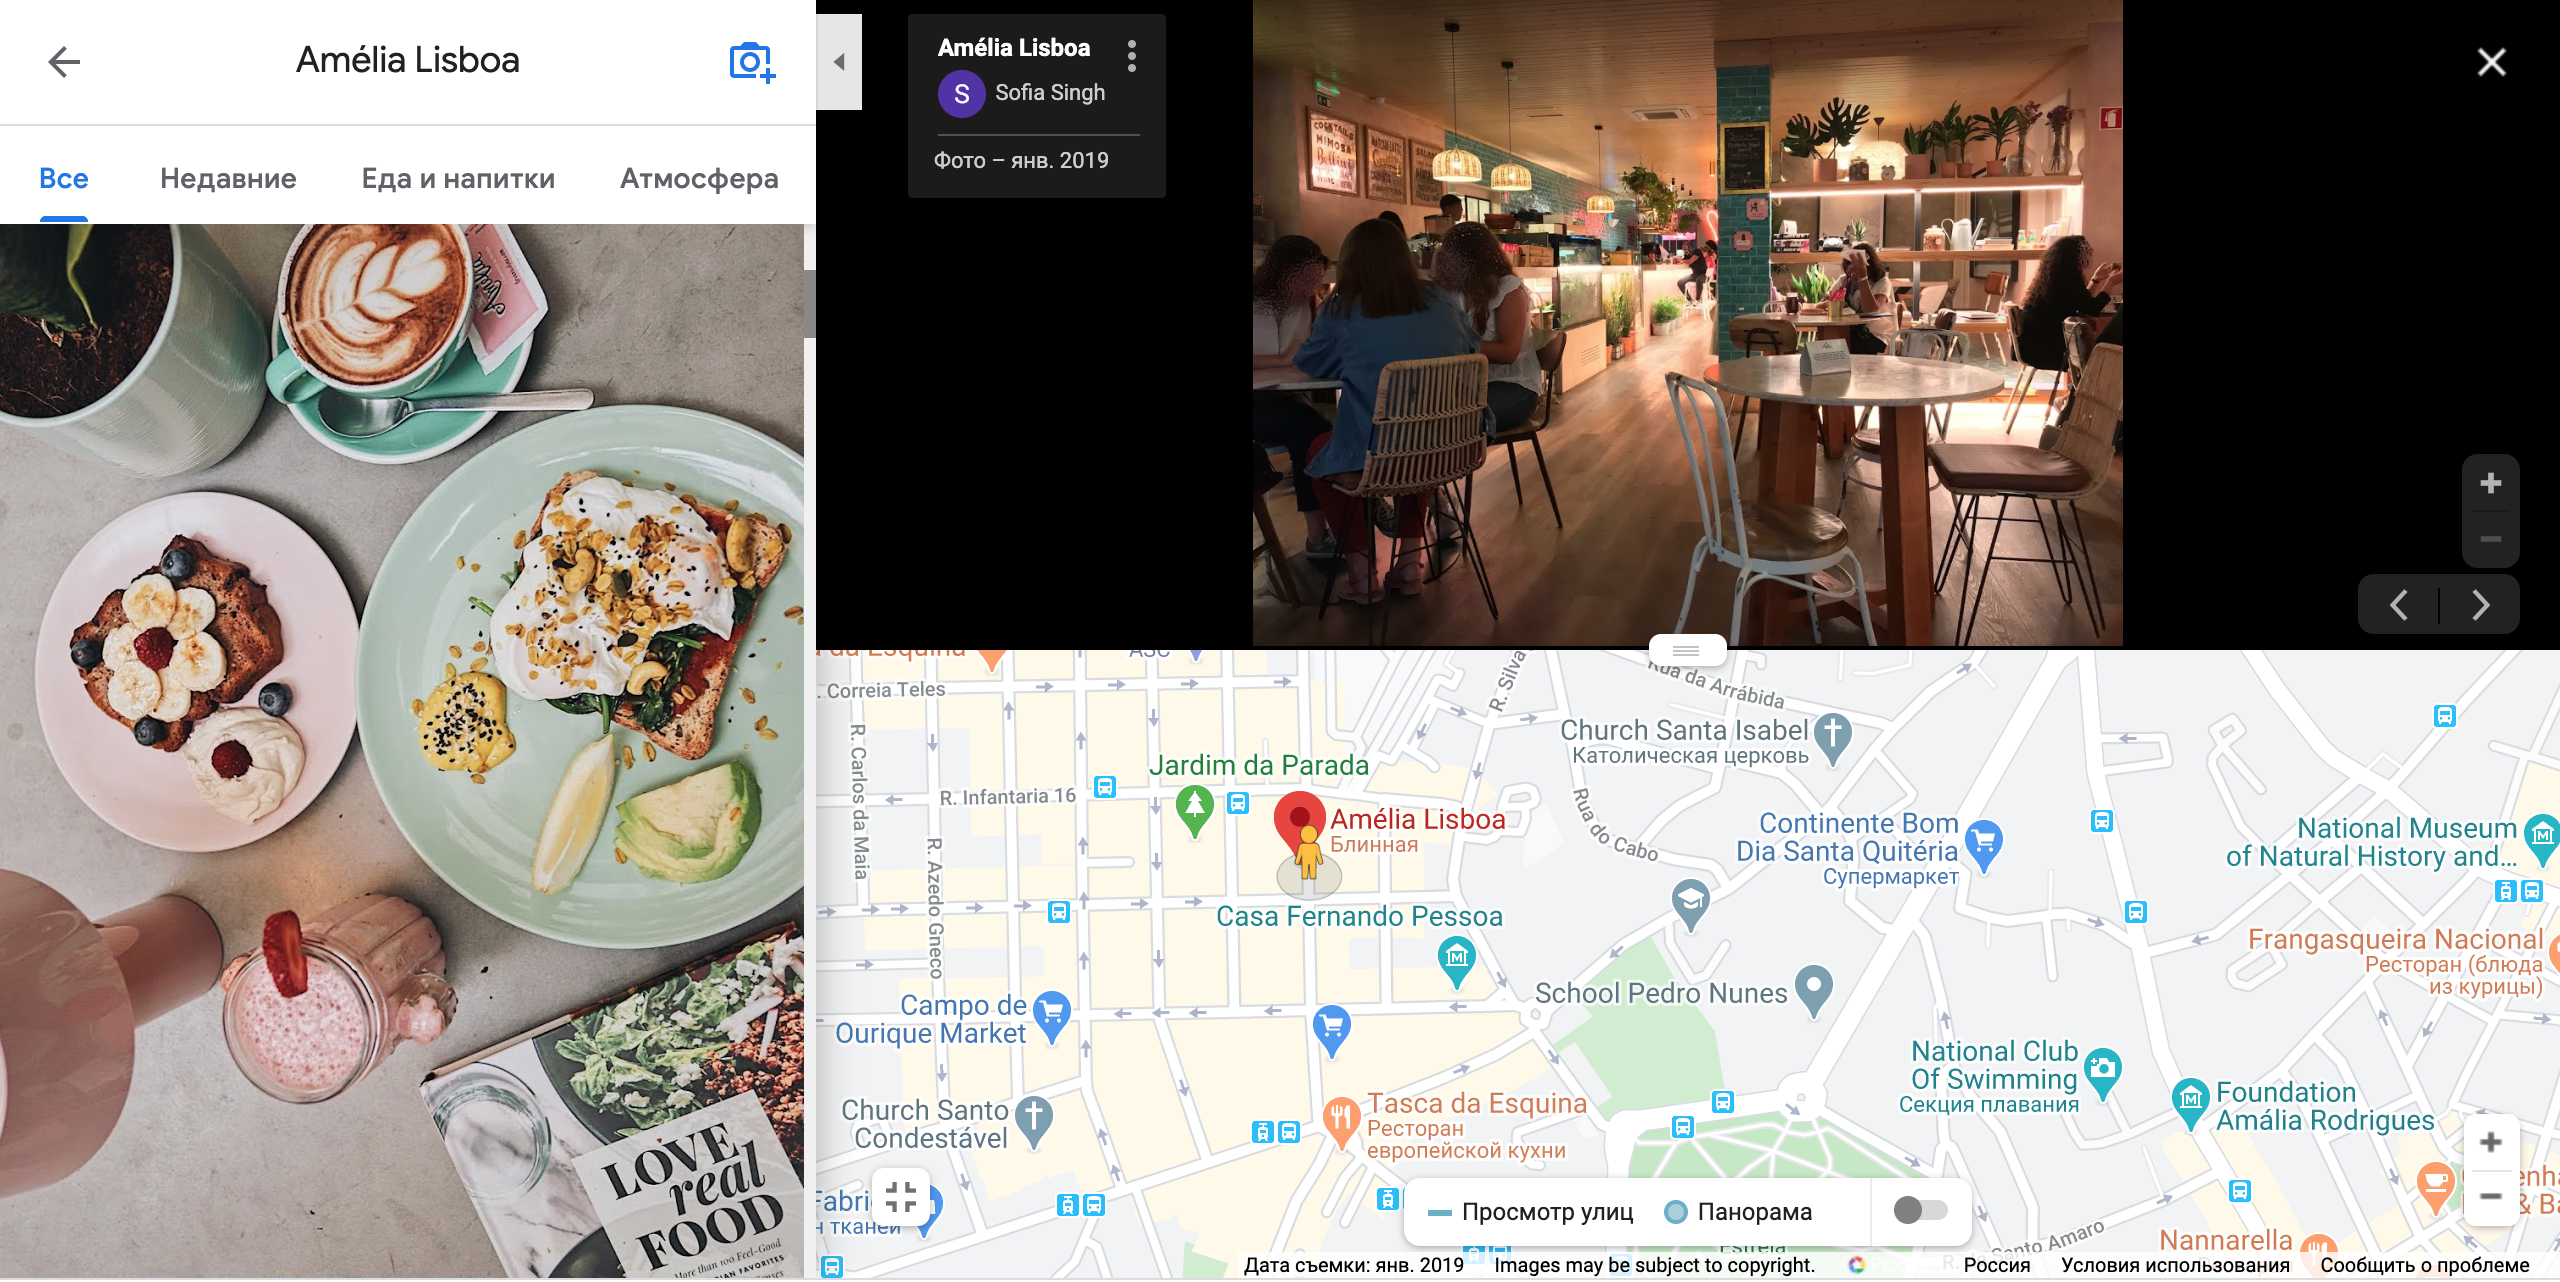 Рестораны Лиссабона Amelia Nicolau Bazilio